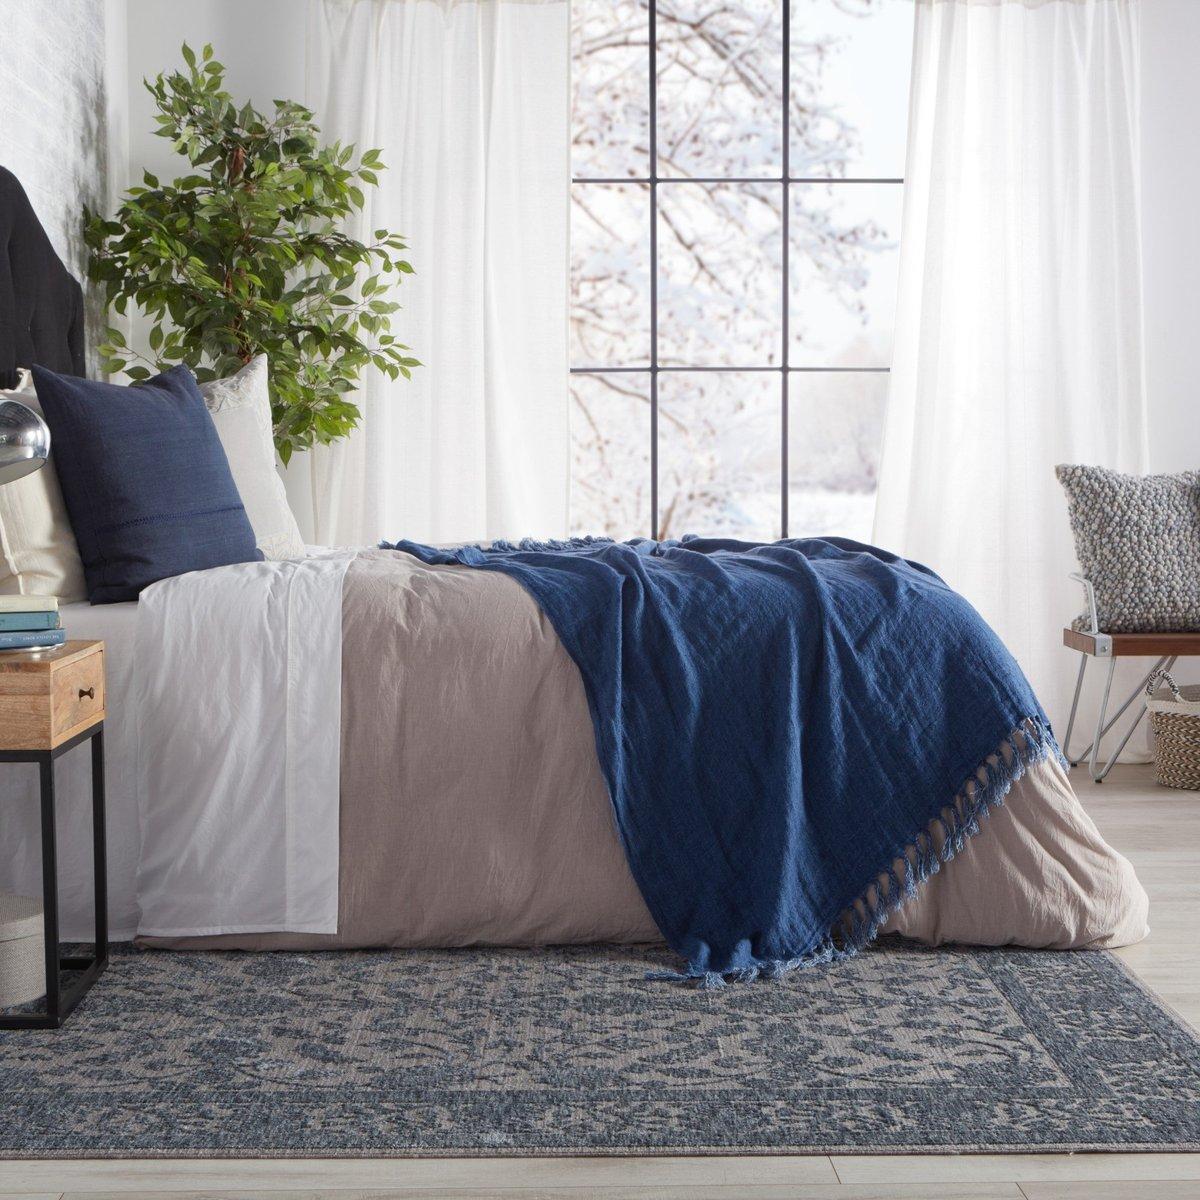 Warm Winter Nights - Bedroom Decor Ideas